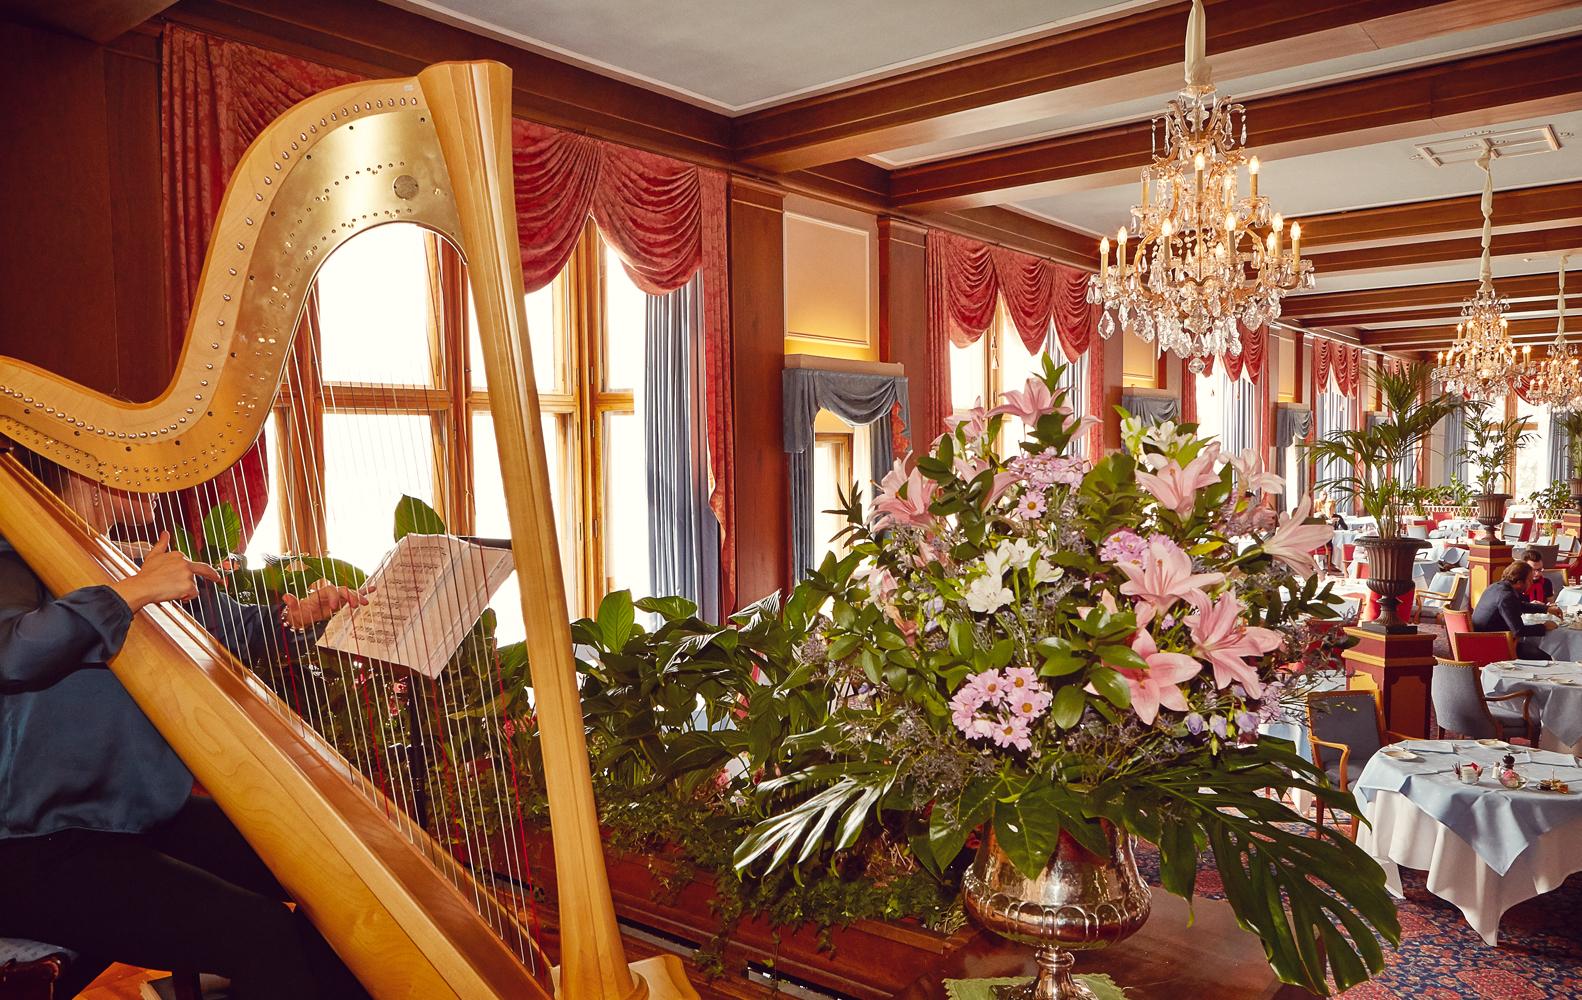 Le Restaurant - Badrutt's Palace Hotel Slide 3